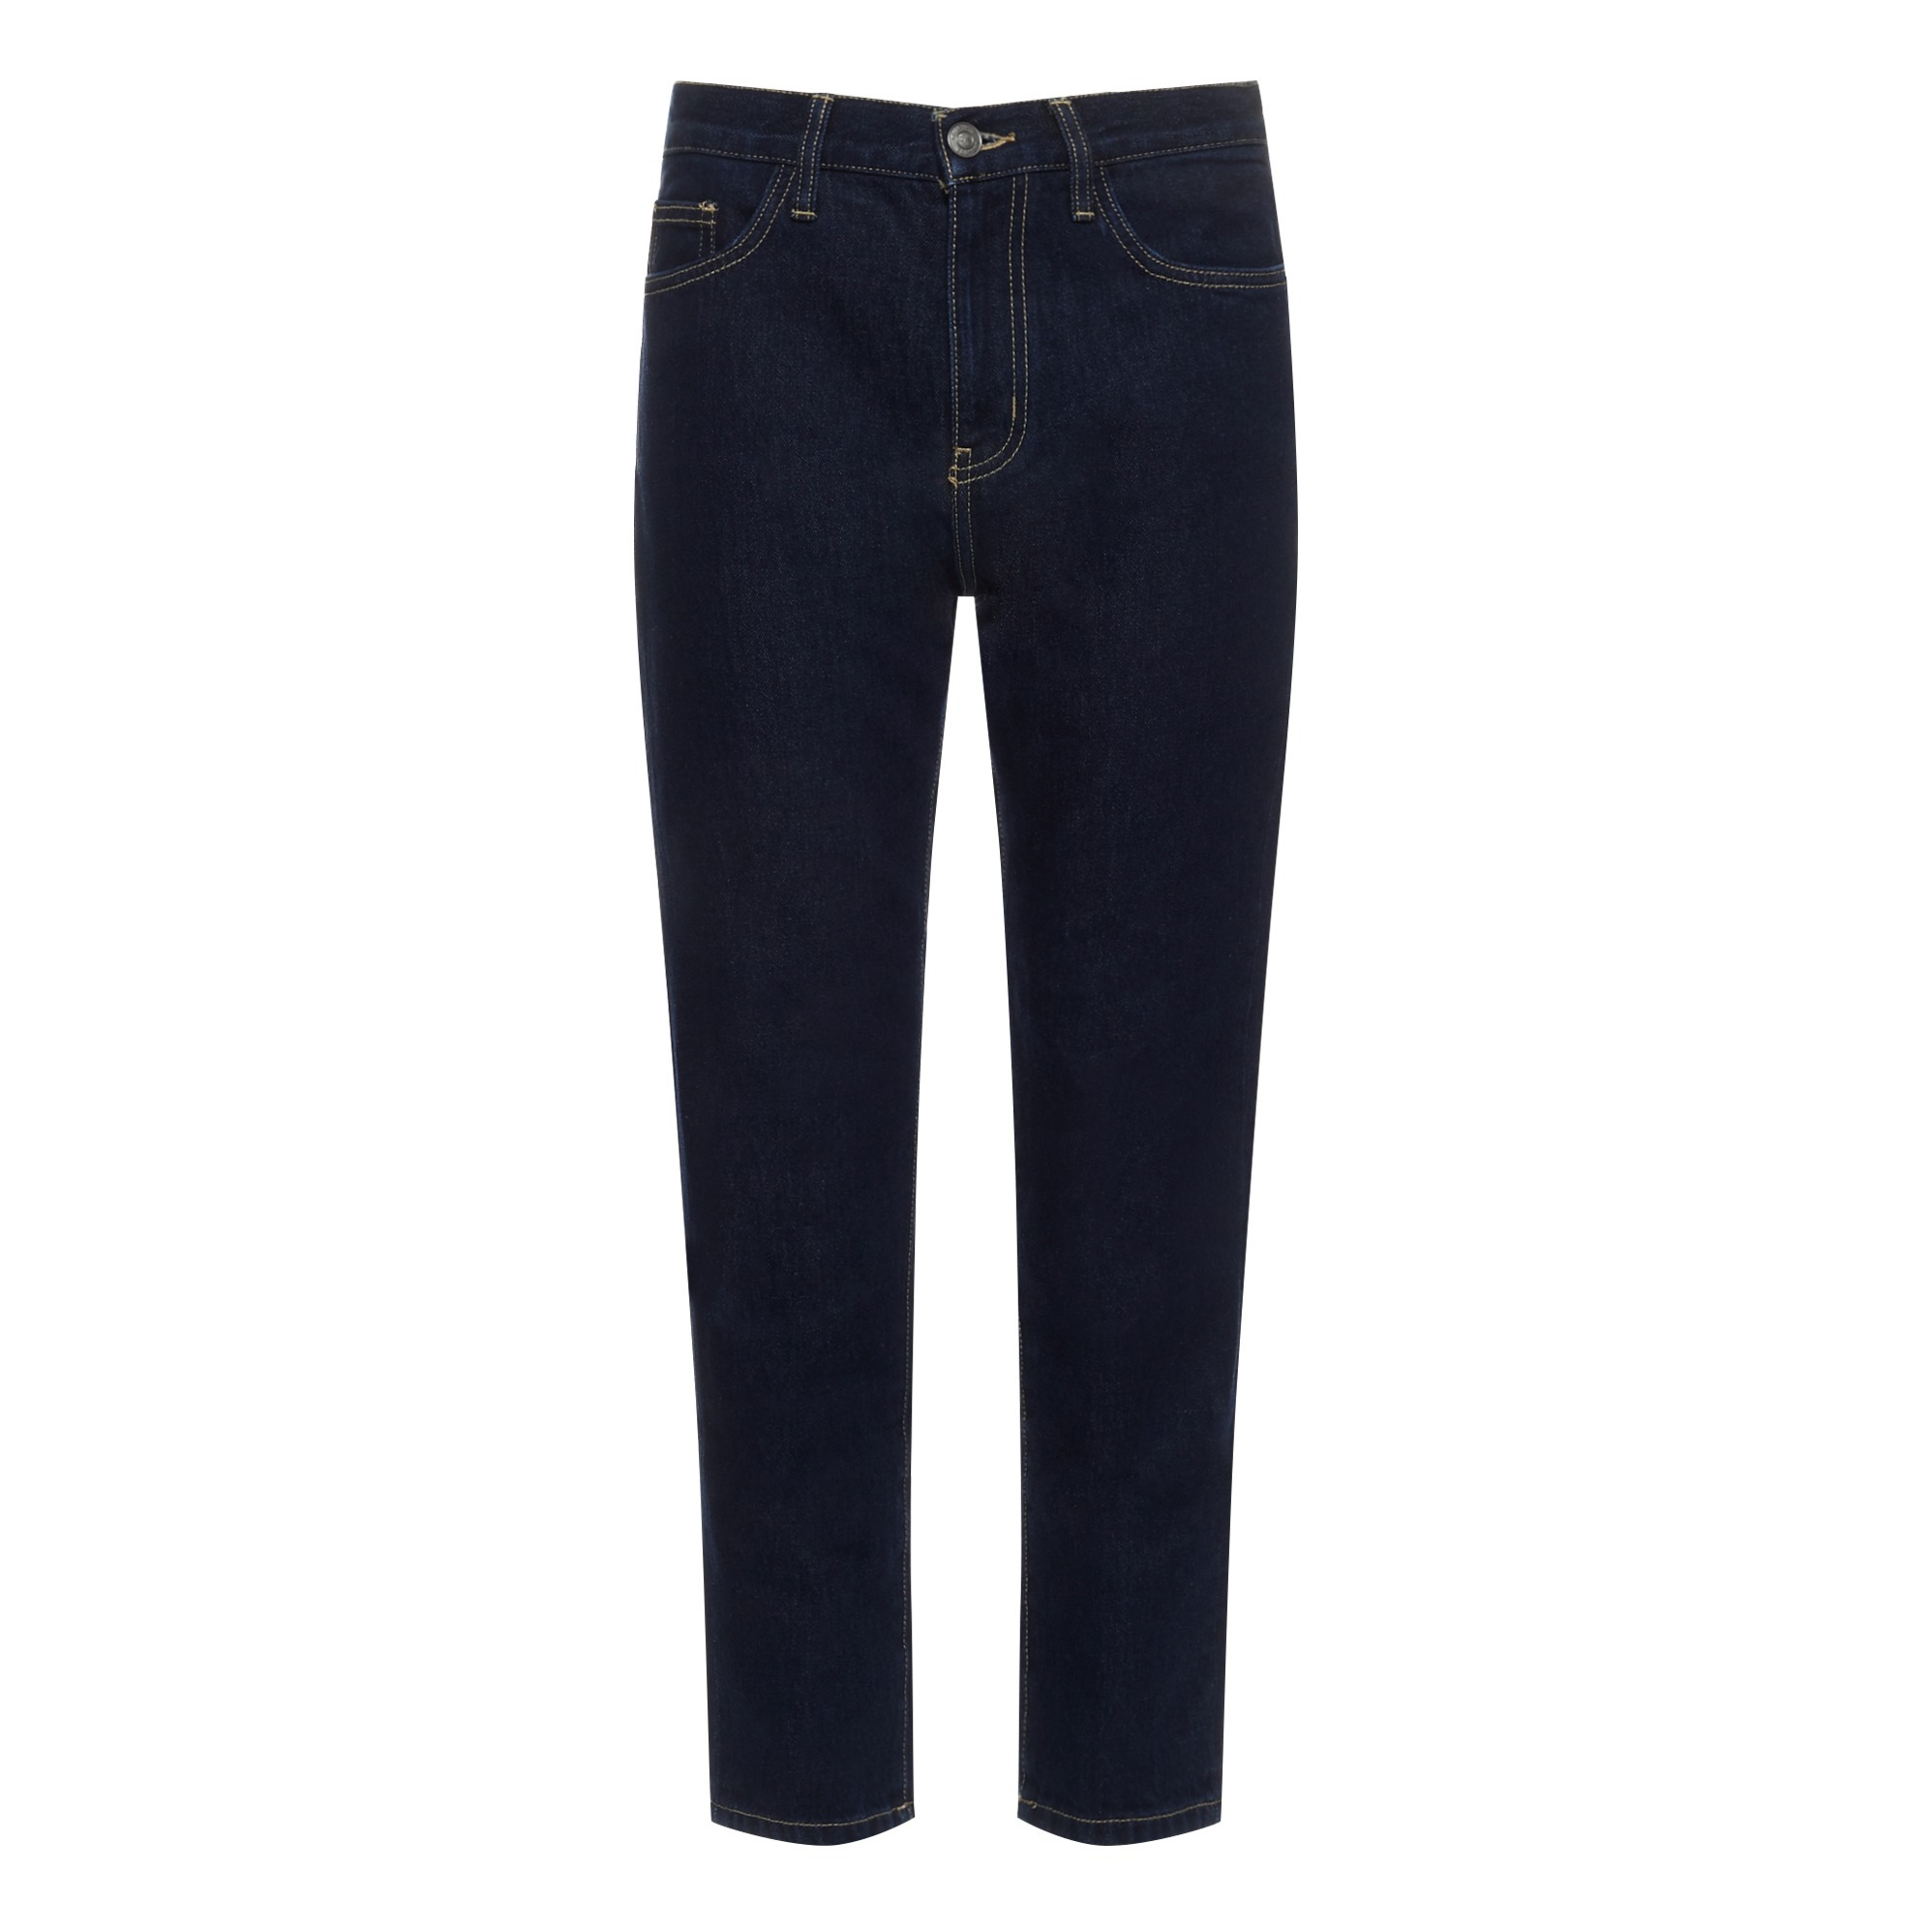 Jeans The Vintage Cropped Slim Hit Tipp 9677